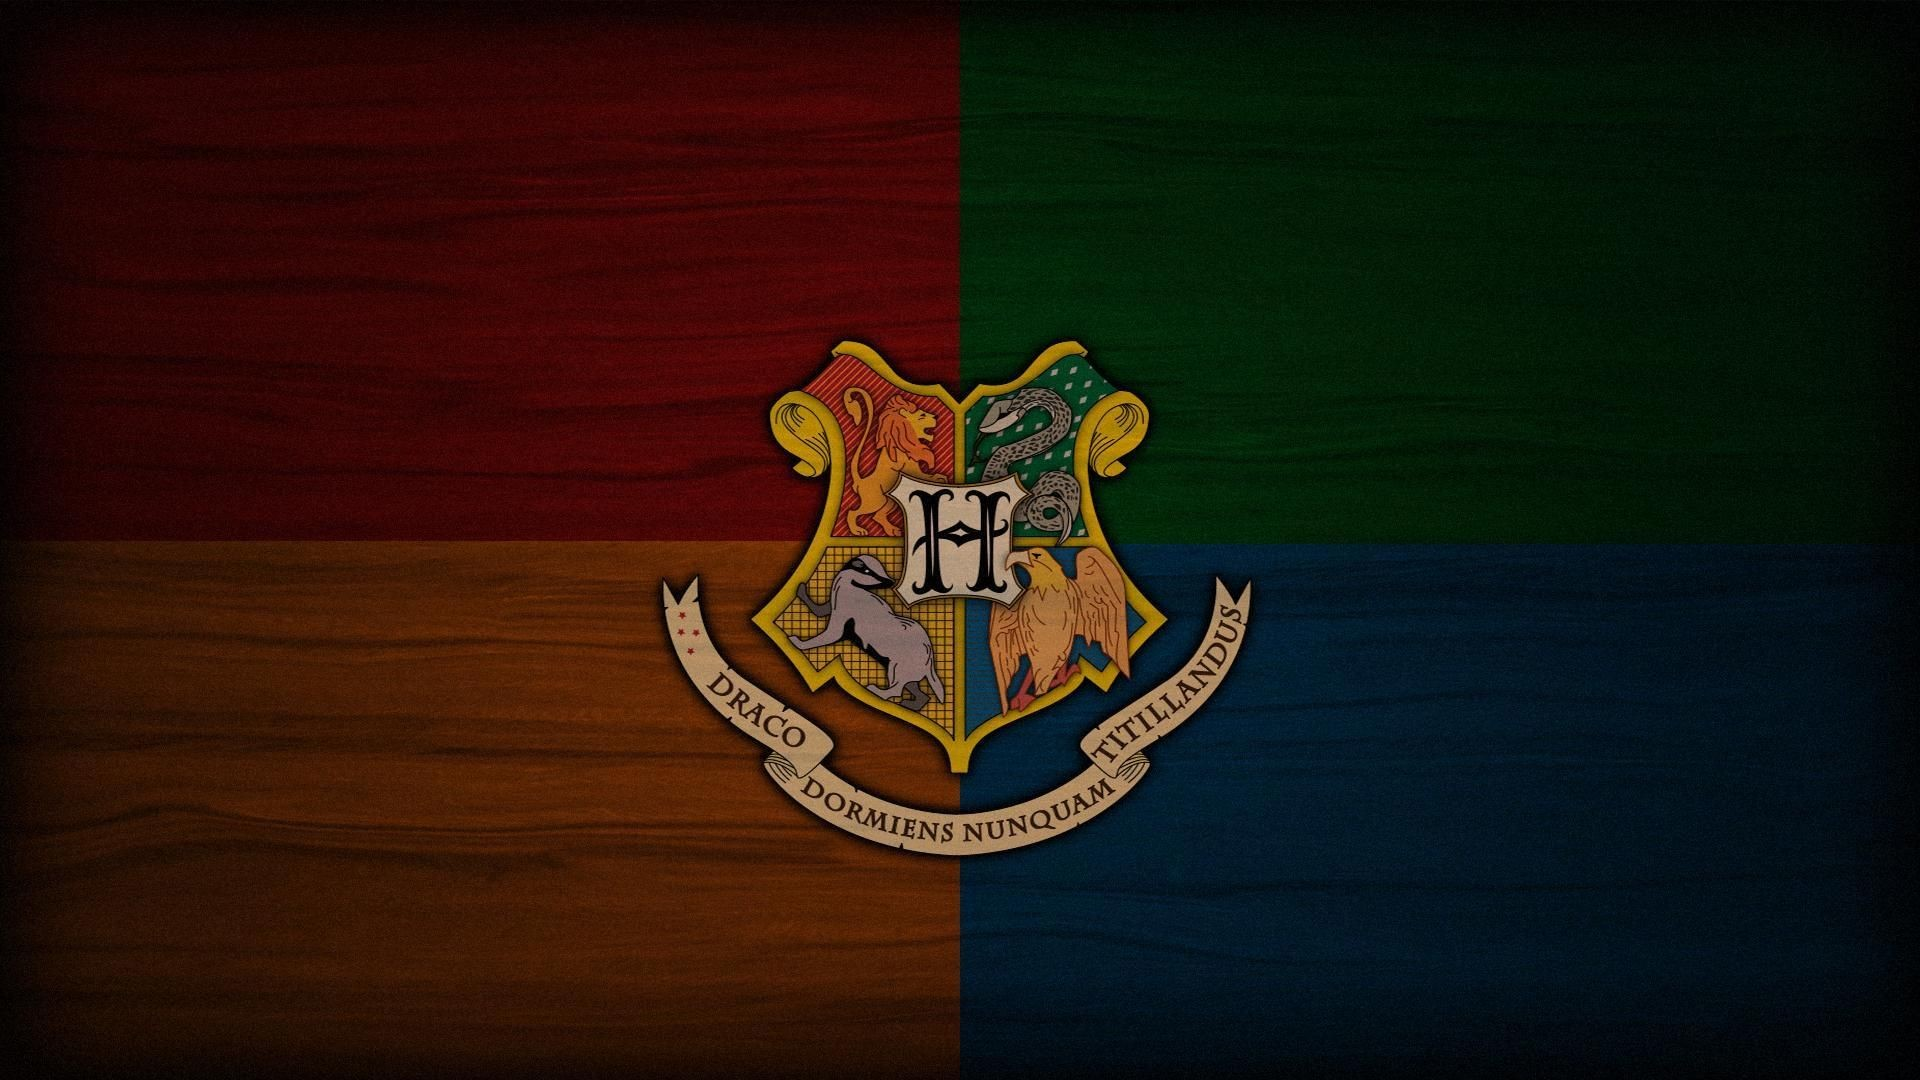 Res: 1920x1080, Harry Potter Slytherin Wallpaper - Live Wallpaper HD